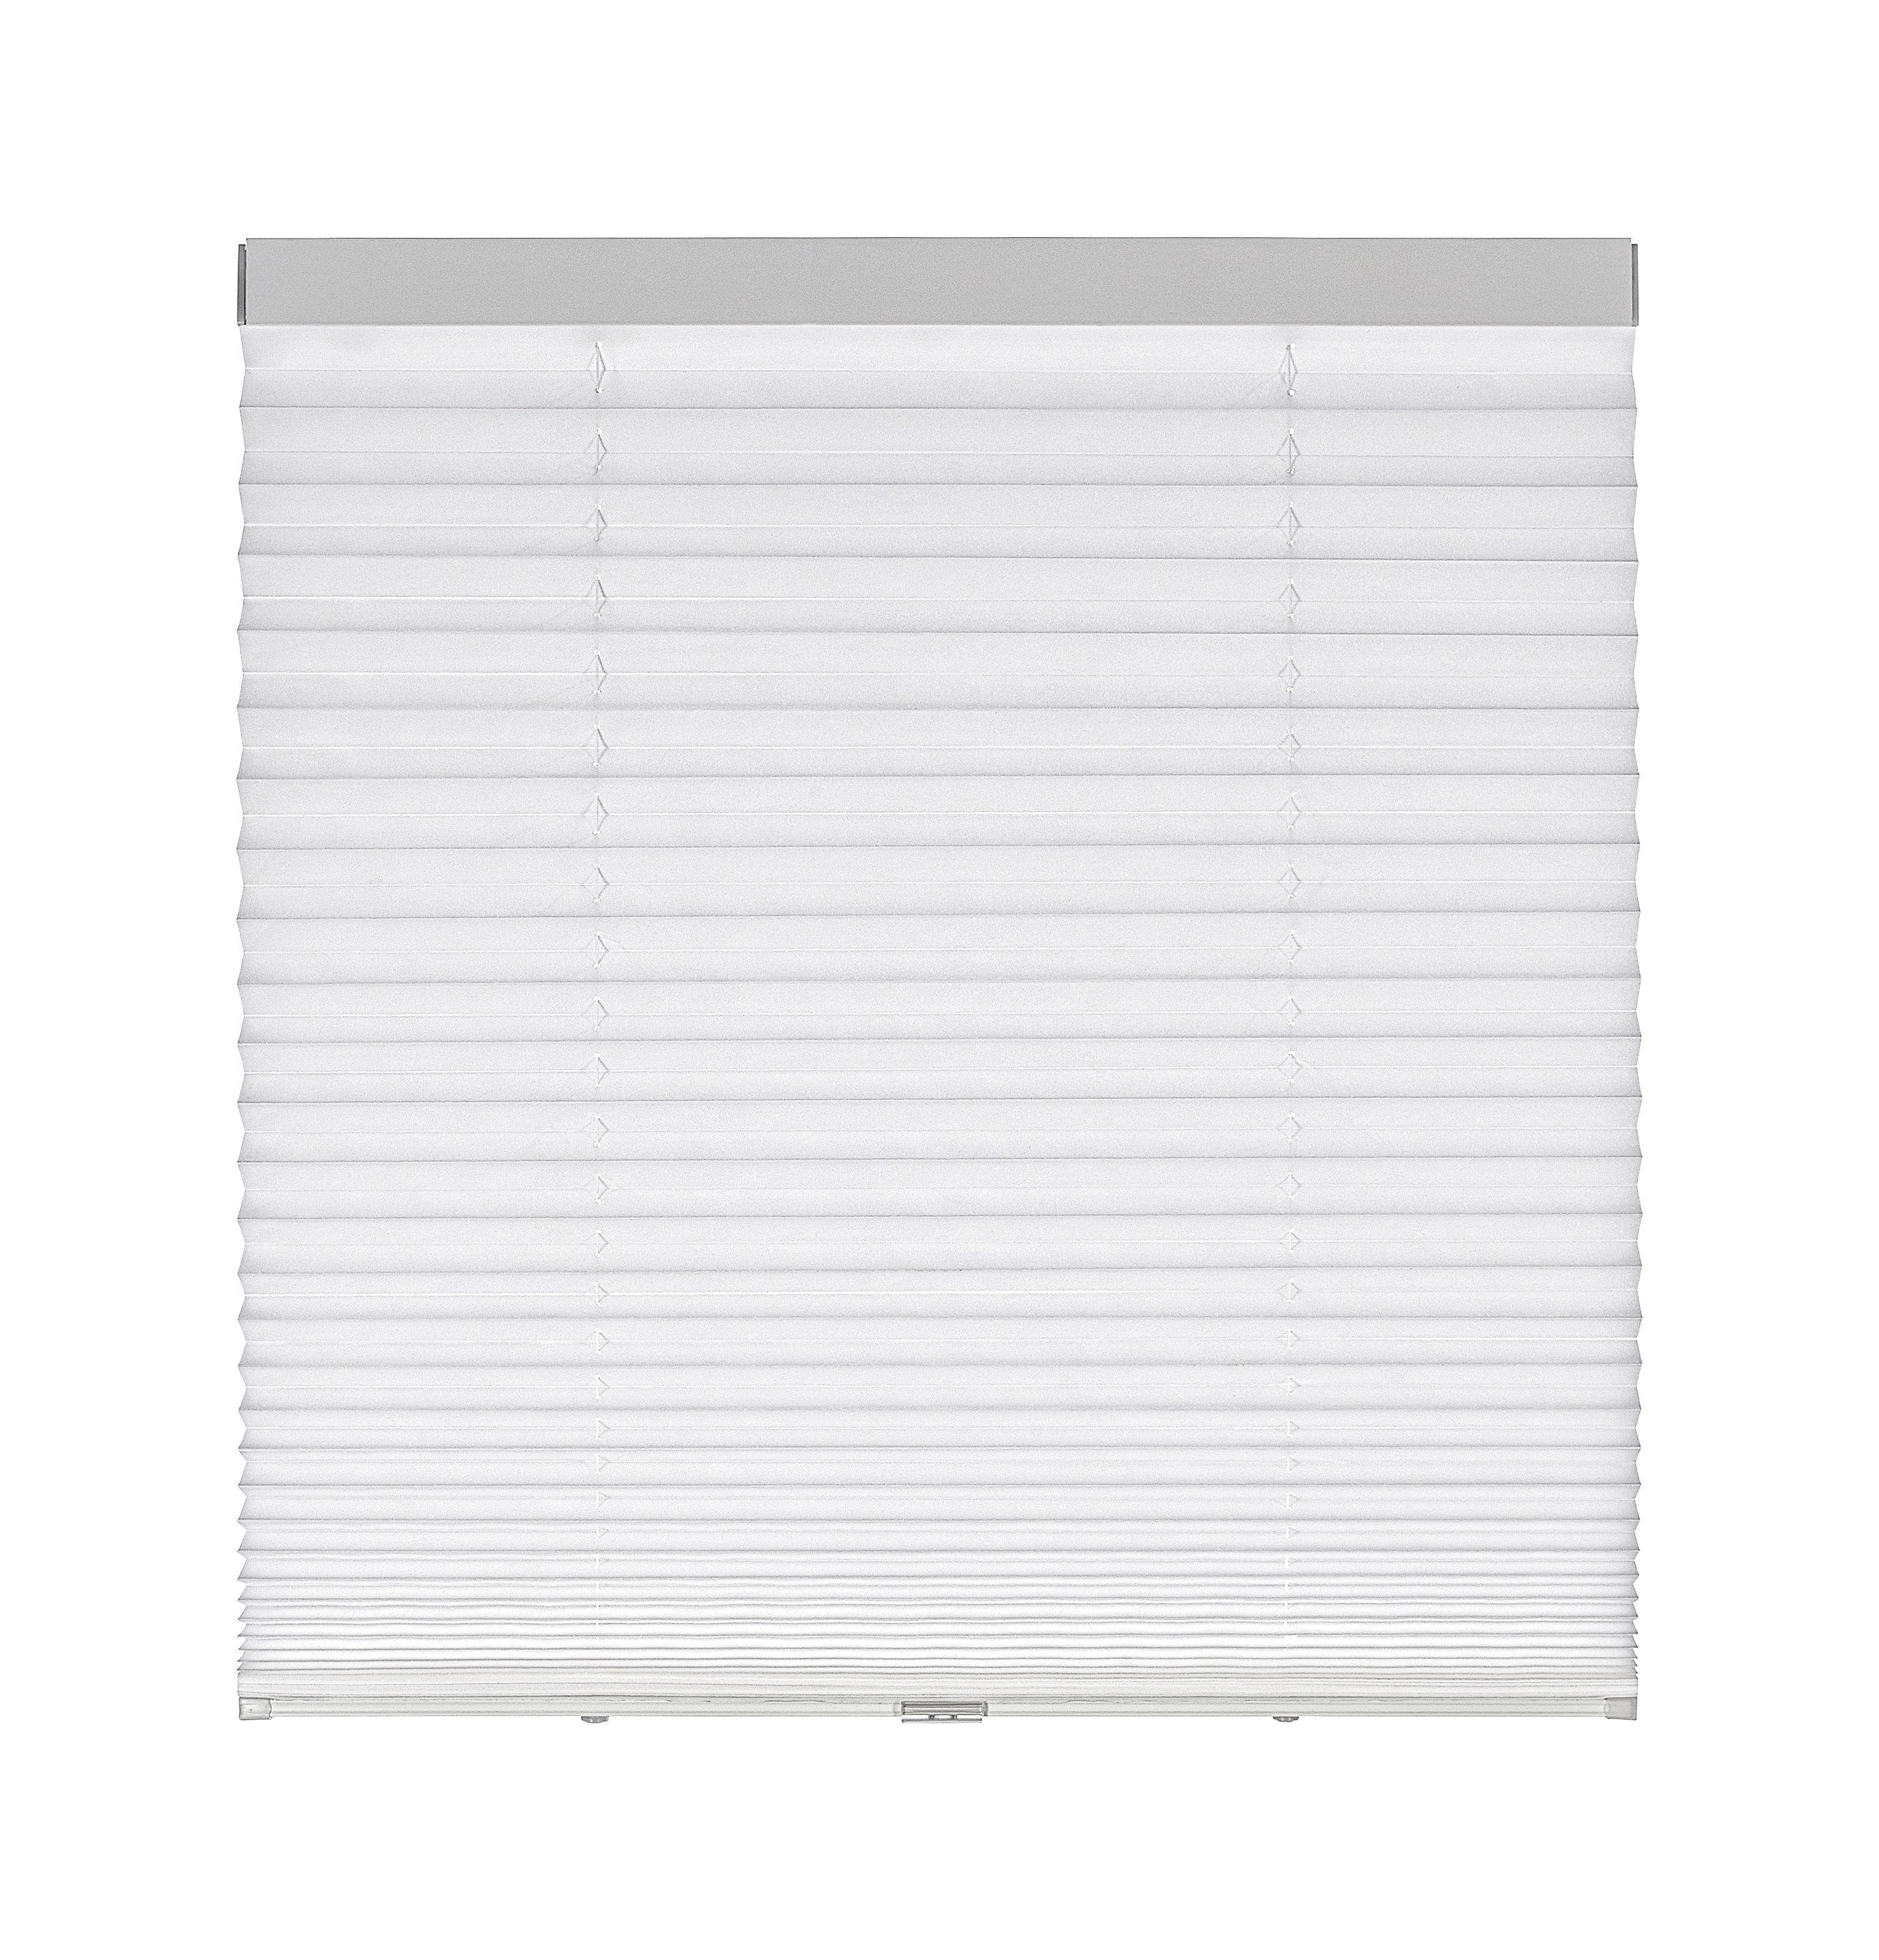 Plissee Joe in Weiß, ca. 100x150cm - Weiß, KONVENTIONELL, Textil (100/150cm) - MÖMAX modern living